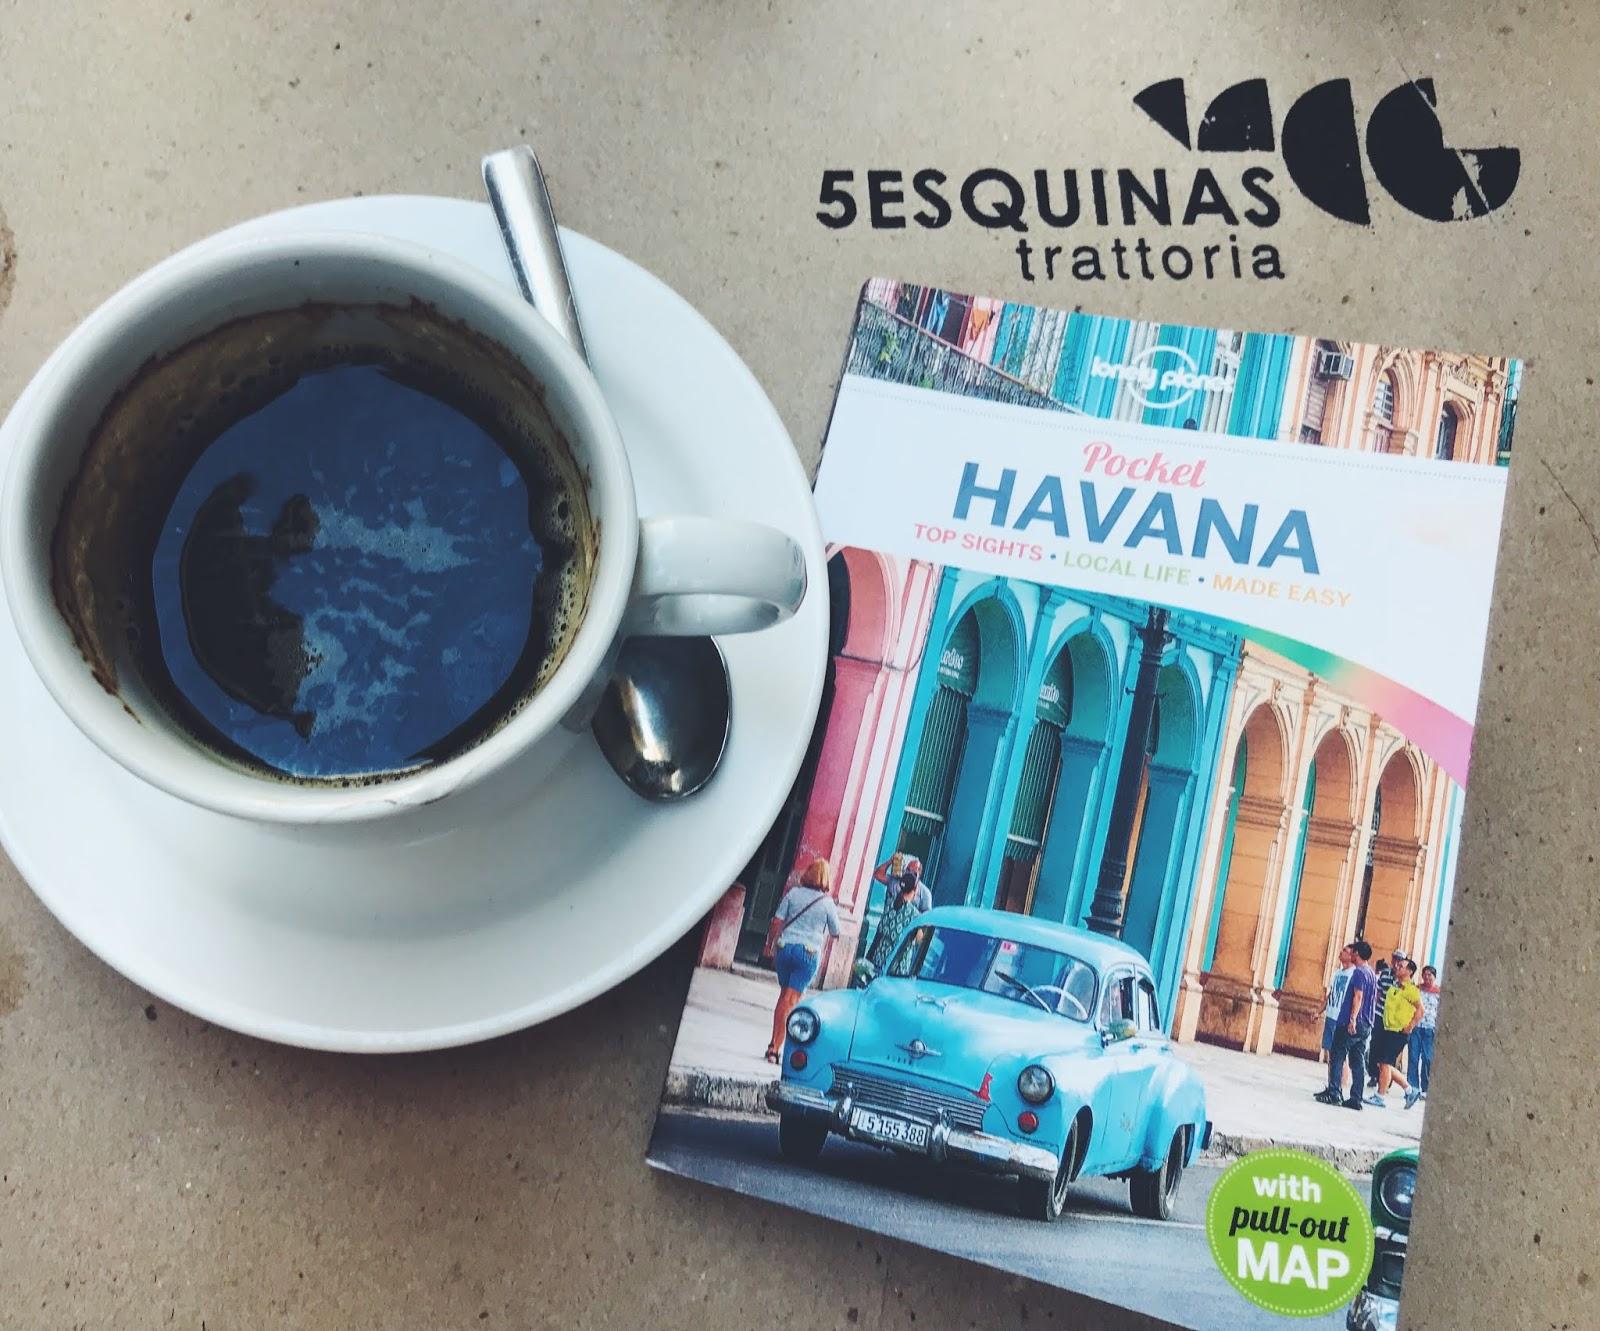 making restorations Havana day 3.7